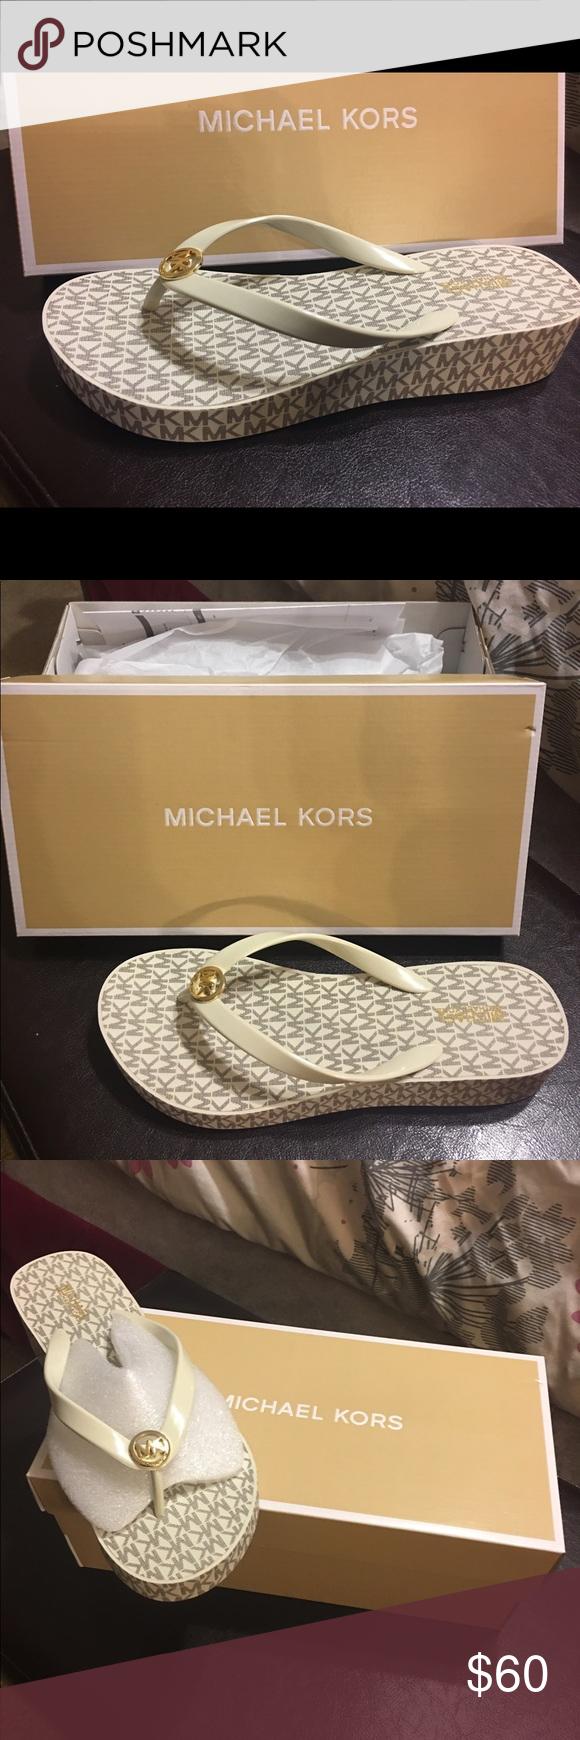 Michael Kors Flip Flops Brand New. Never Wore them. Size 8. In box still Michael Kors Shoes